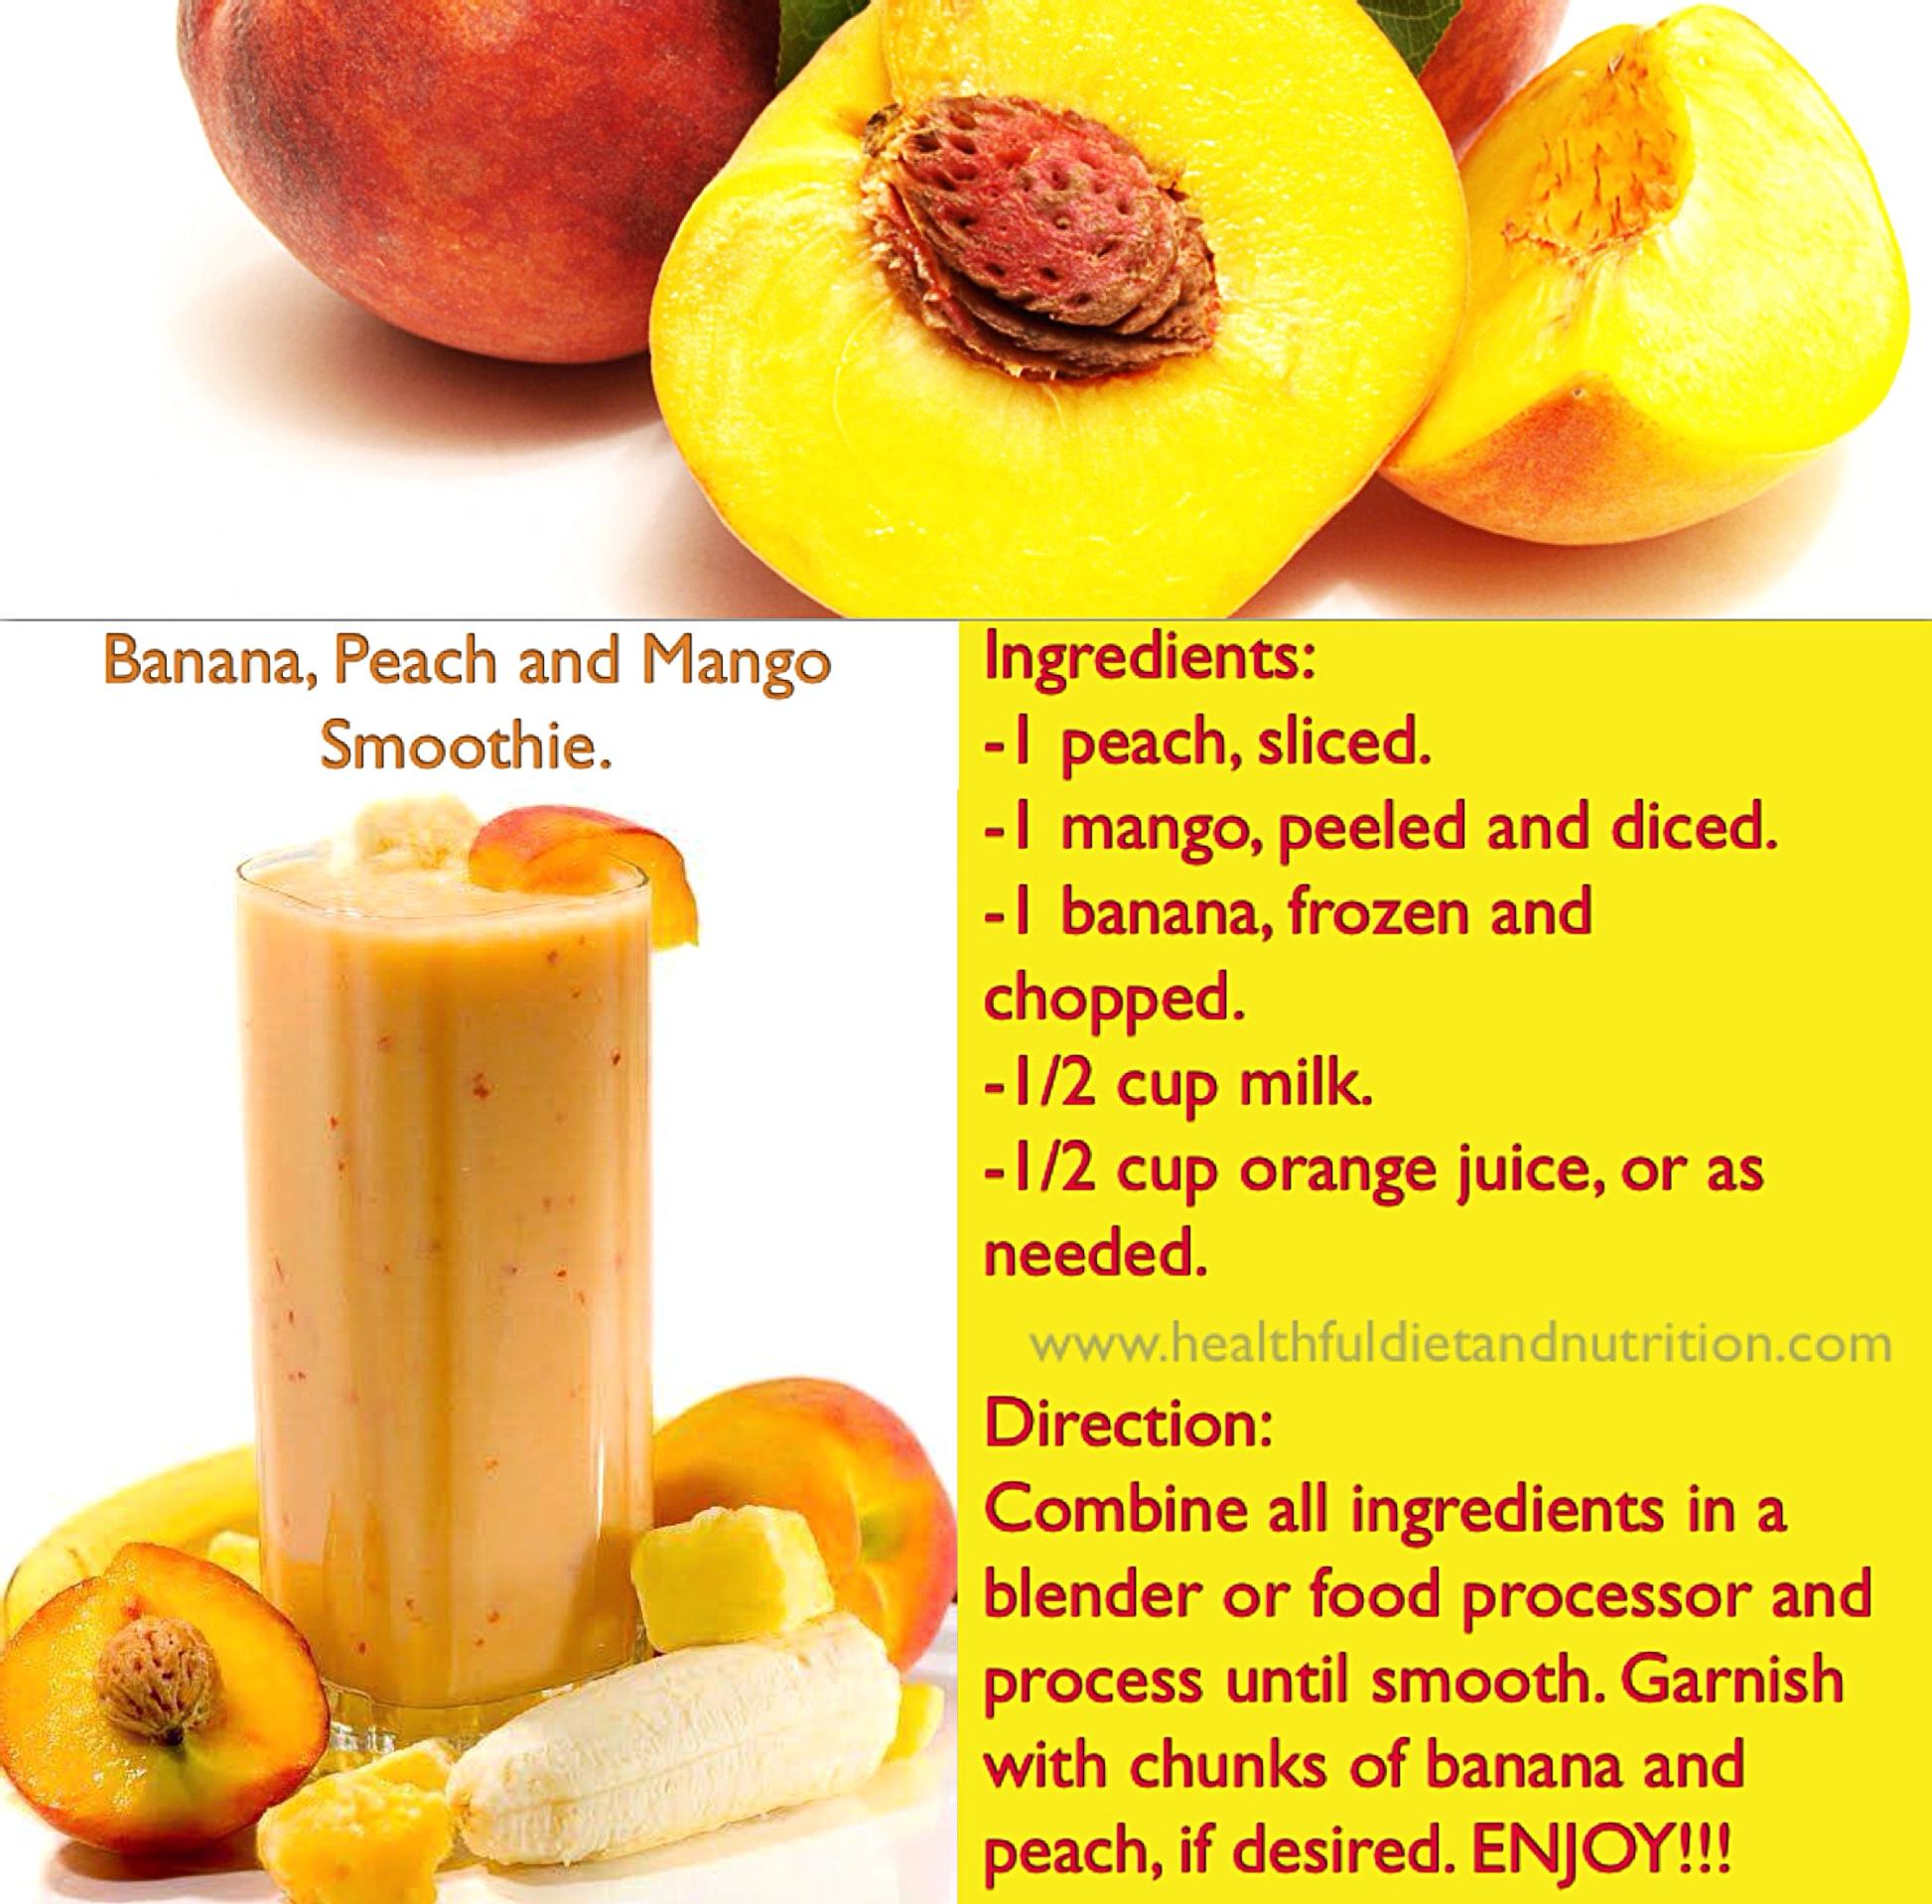 Banana, Peach and Mango Smoothie